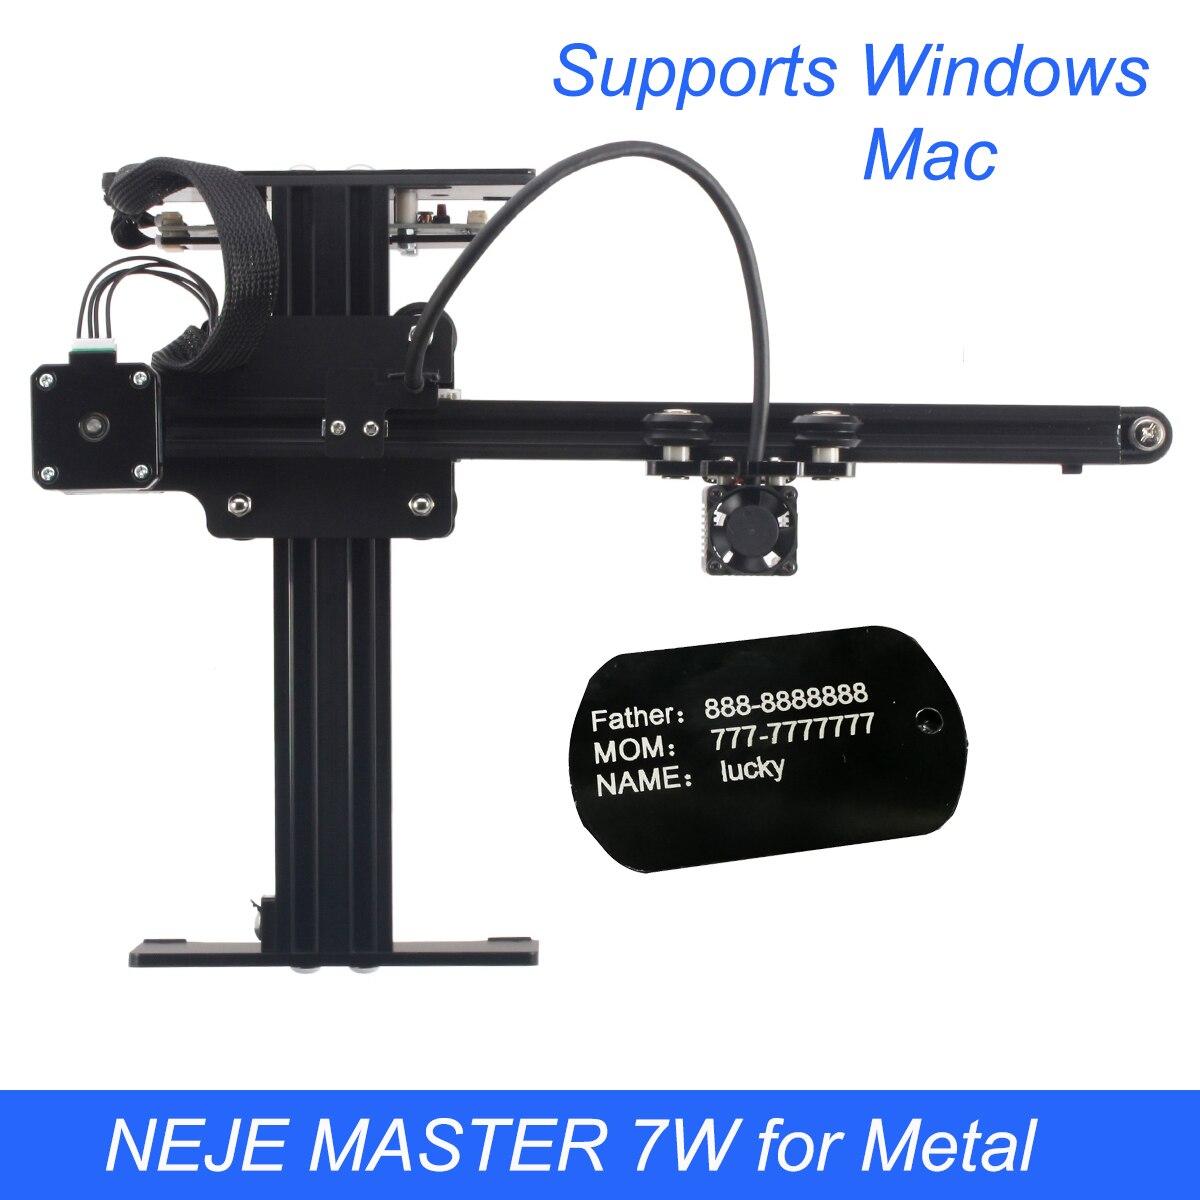 NEJE MASTER 3500mW /7W Laser Engraving Machine DIY Mini CNC Cutting Wood Router Desktop Engraver for Metal/Wood/Plastics